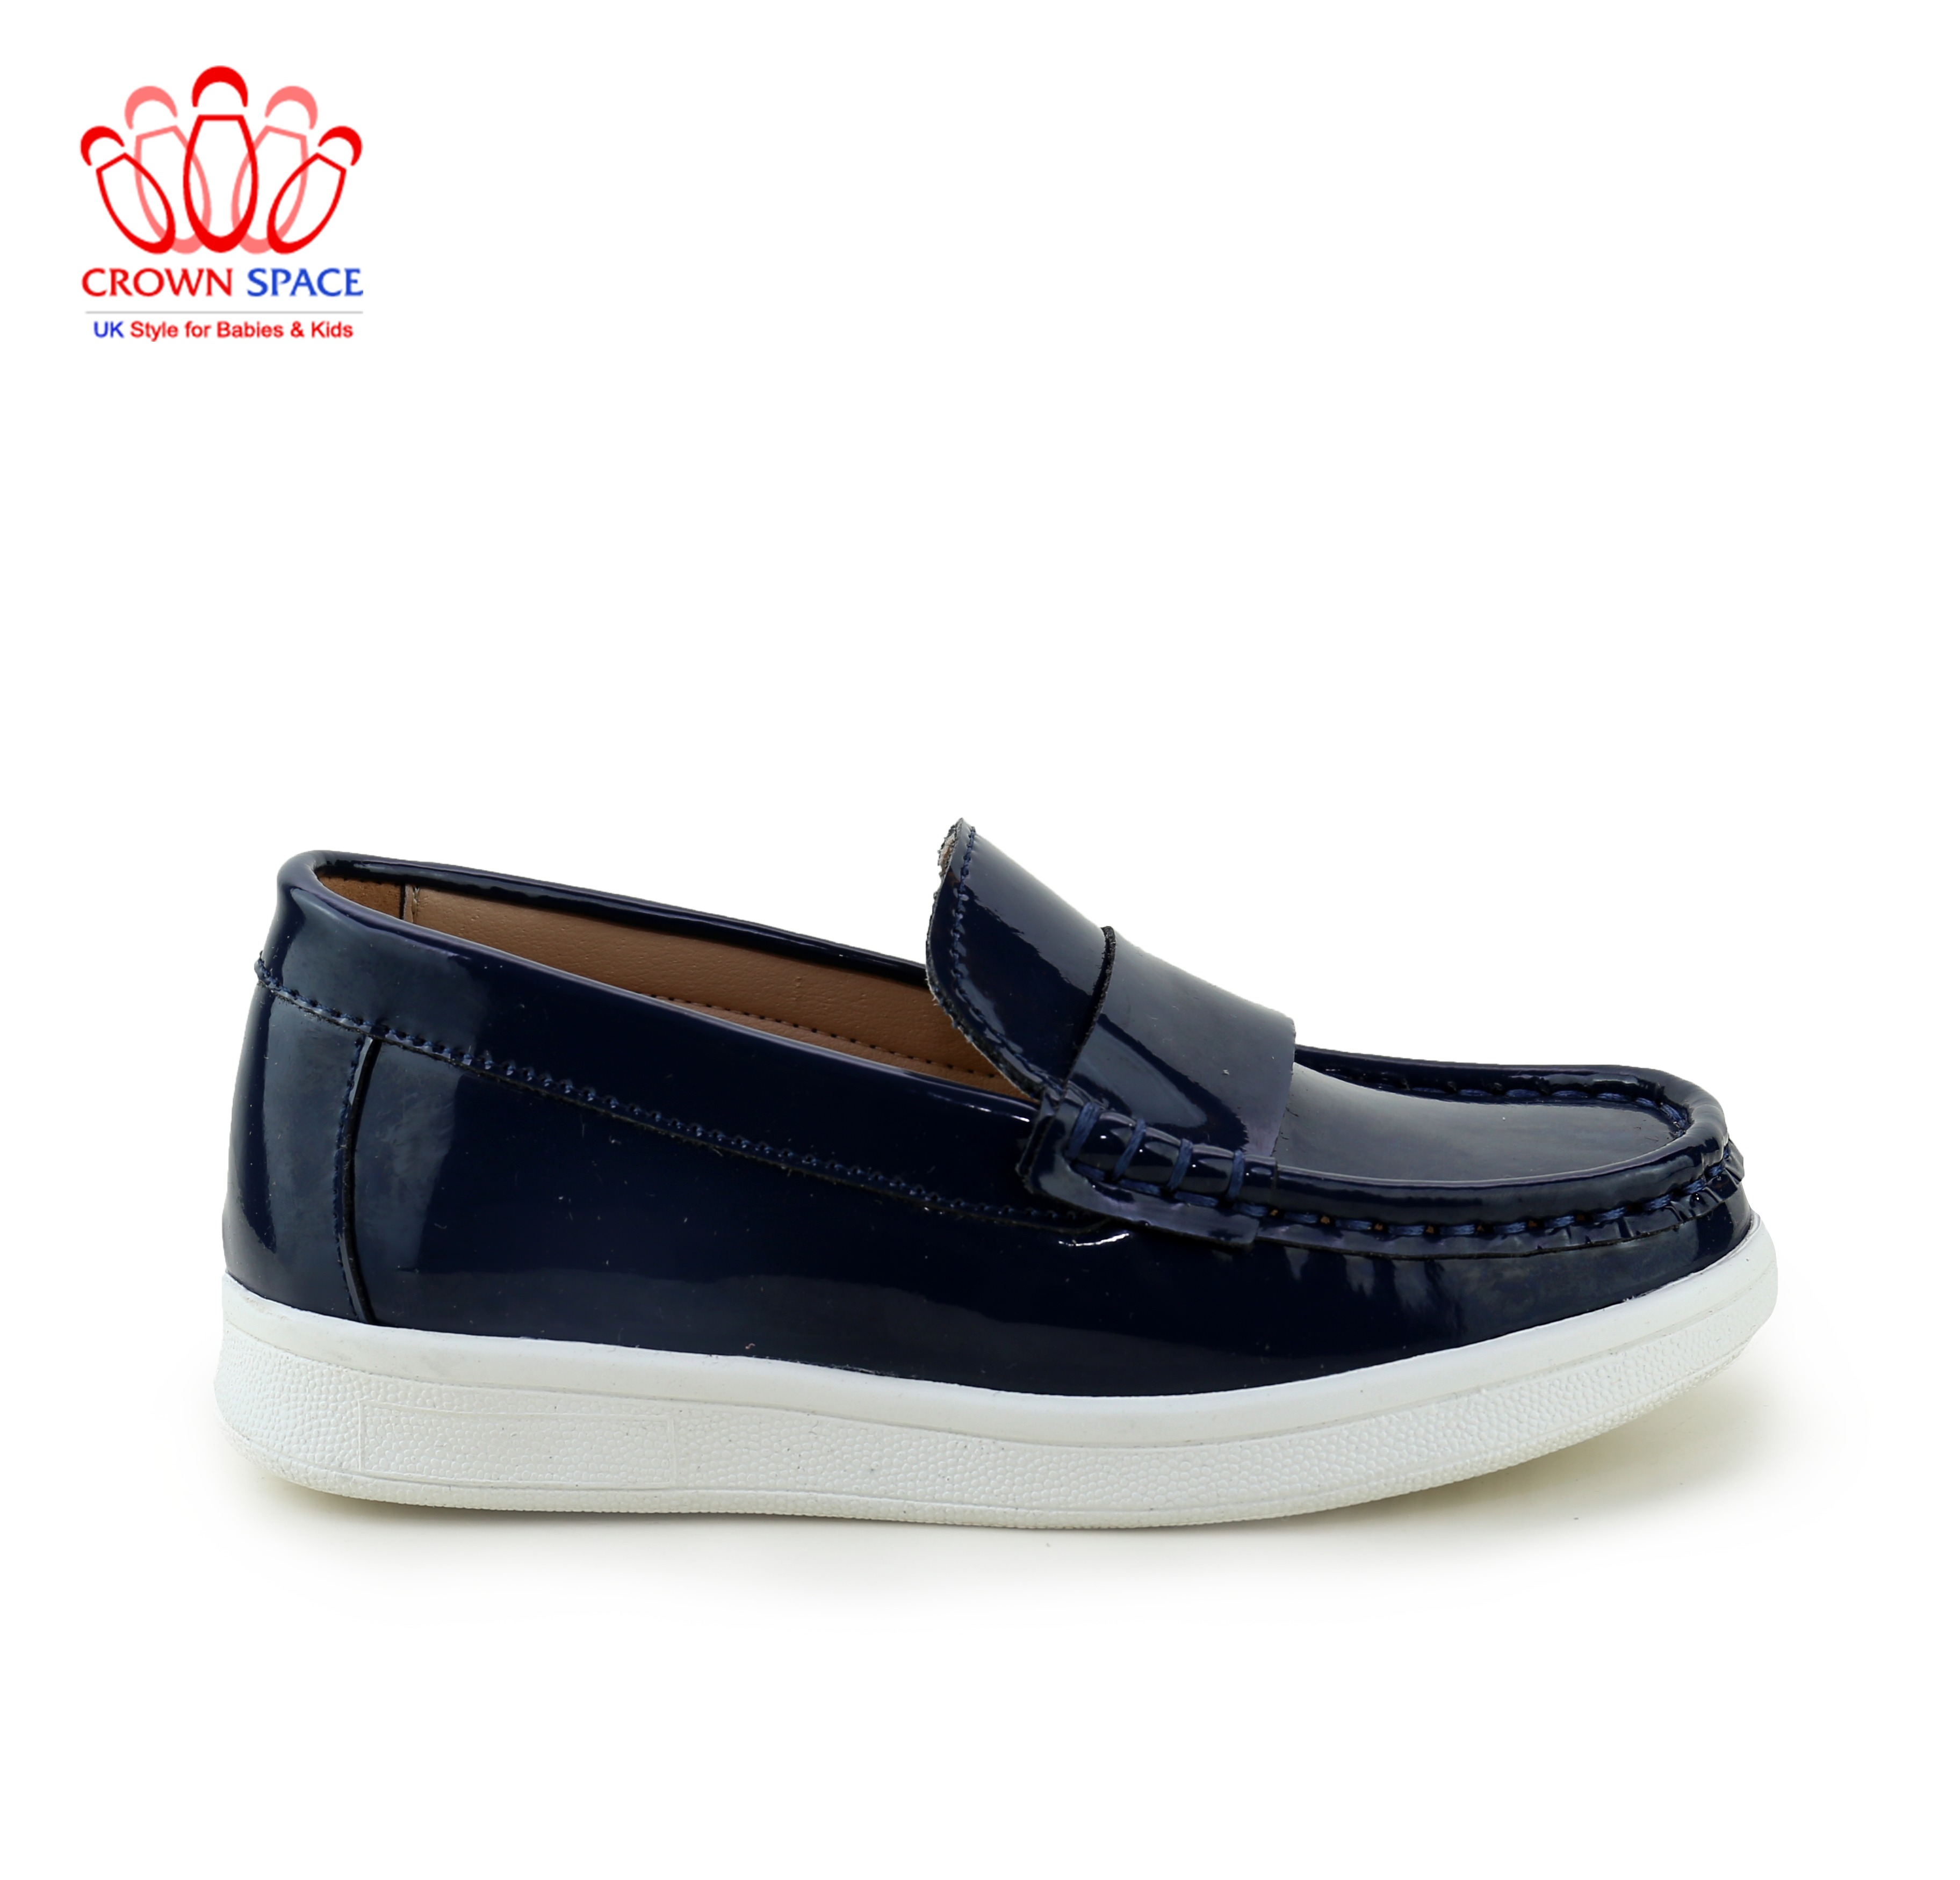 Giày Lười Loafer Bé Trai Đẹp CrownUK George Louis Moccasin Trẻ em Nam Cao Cấp CRUK436 Nhẹ Size 26-31/2-12 Tuổi